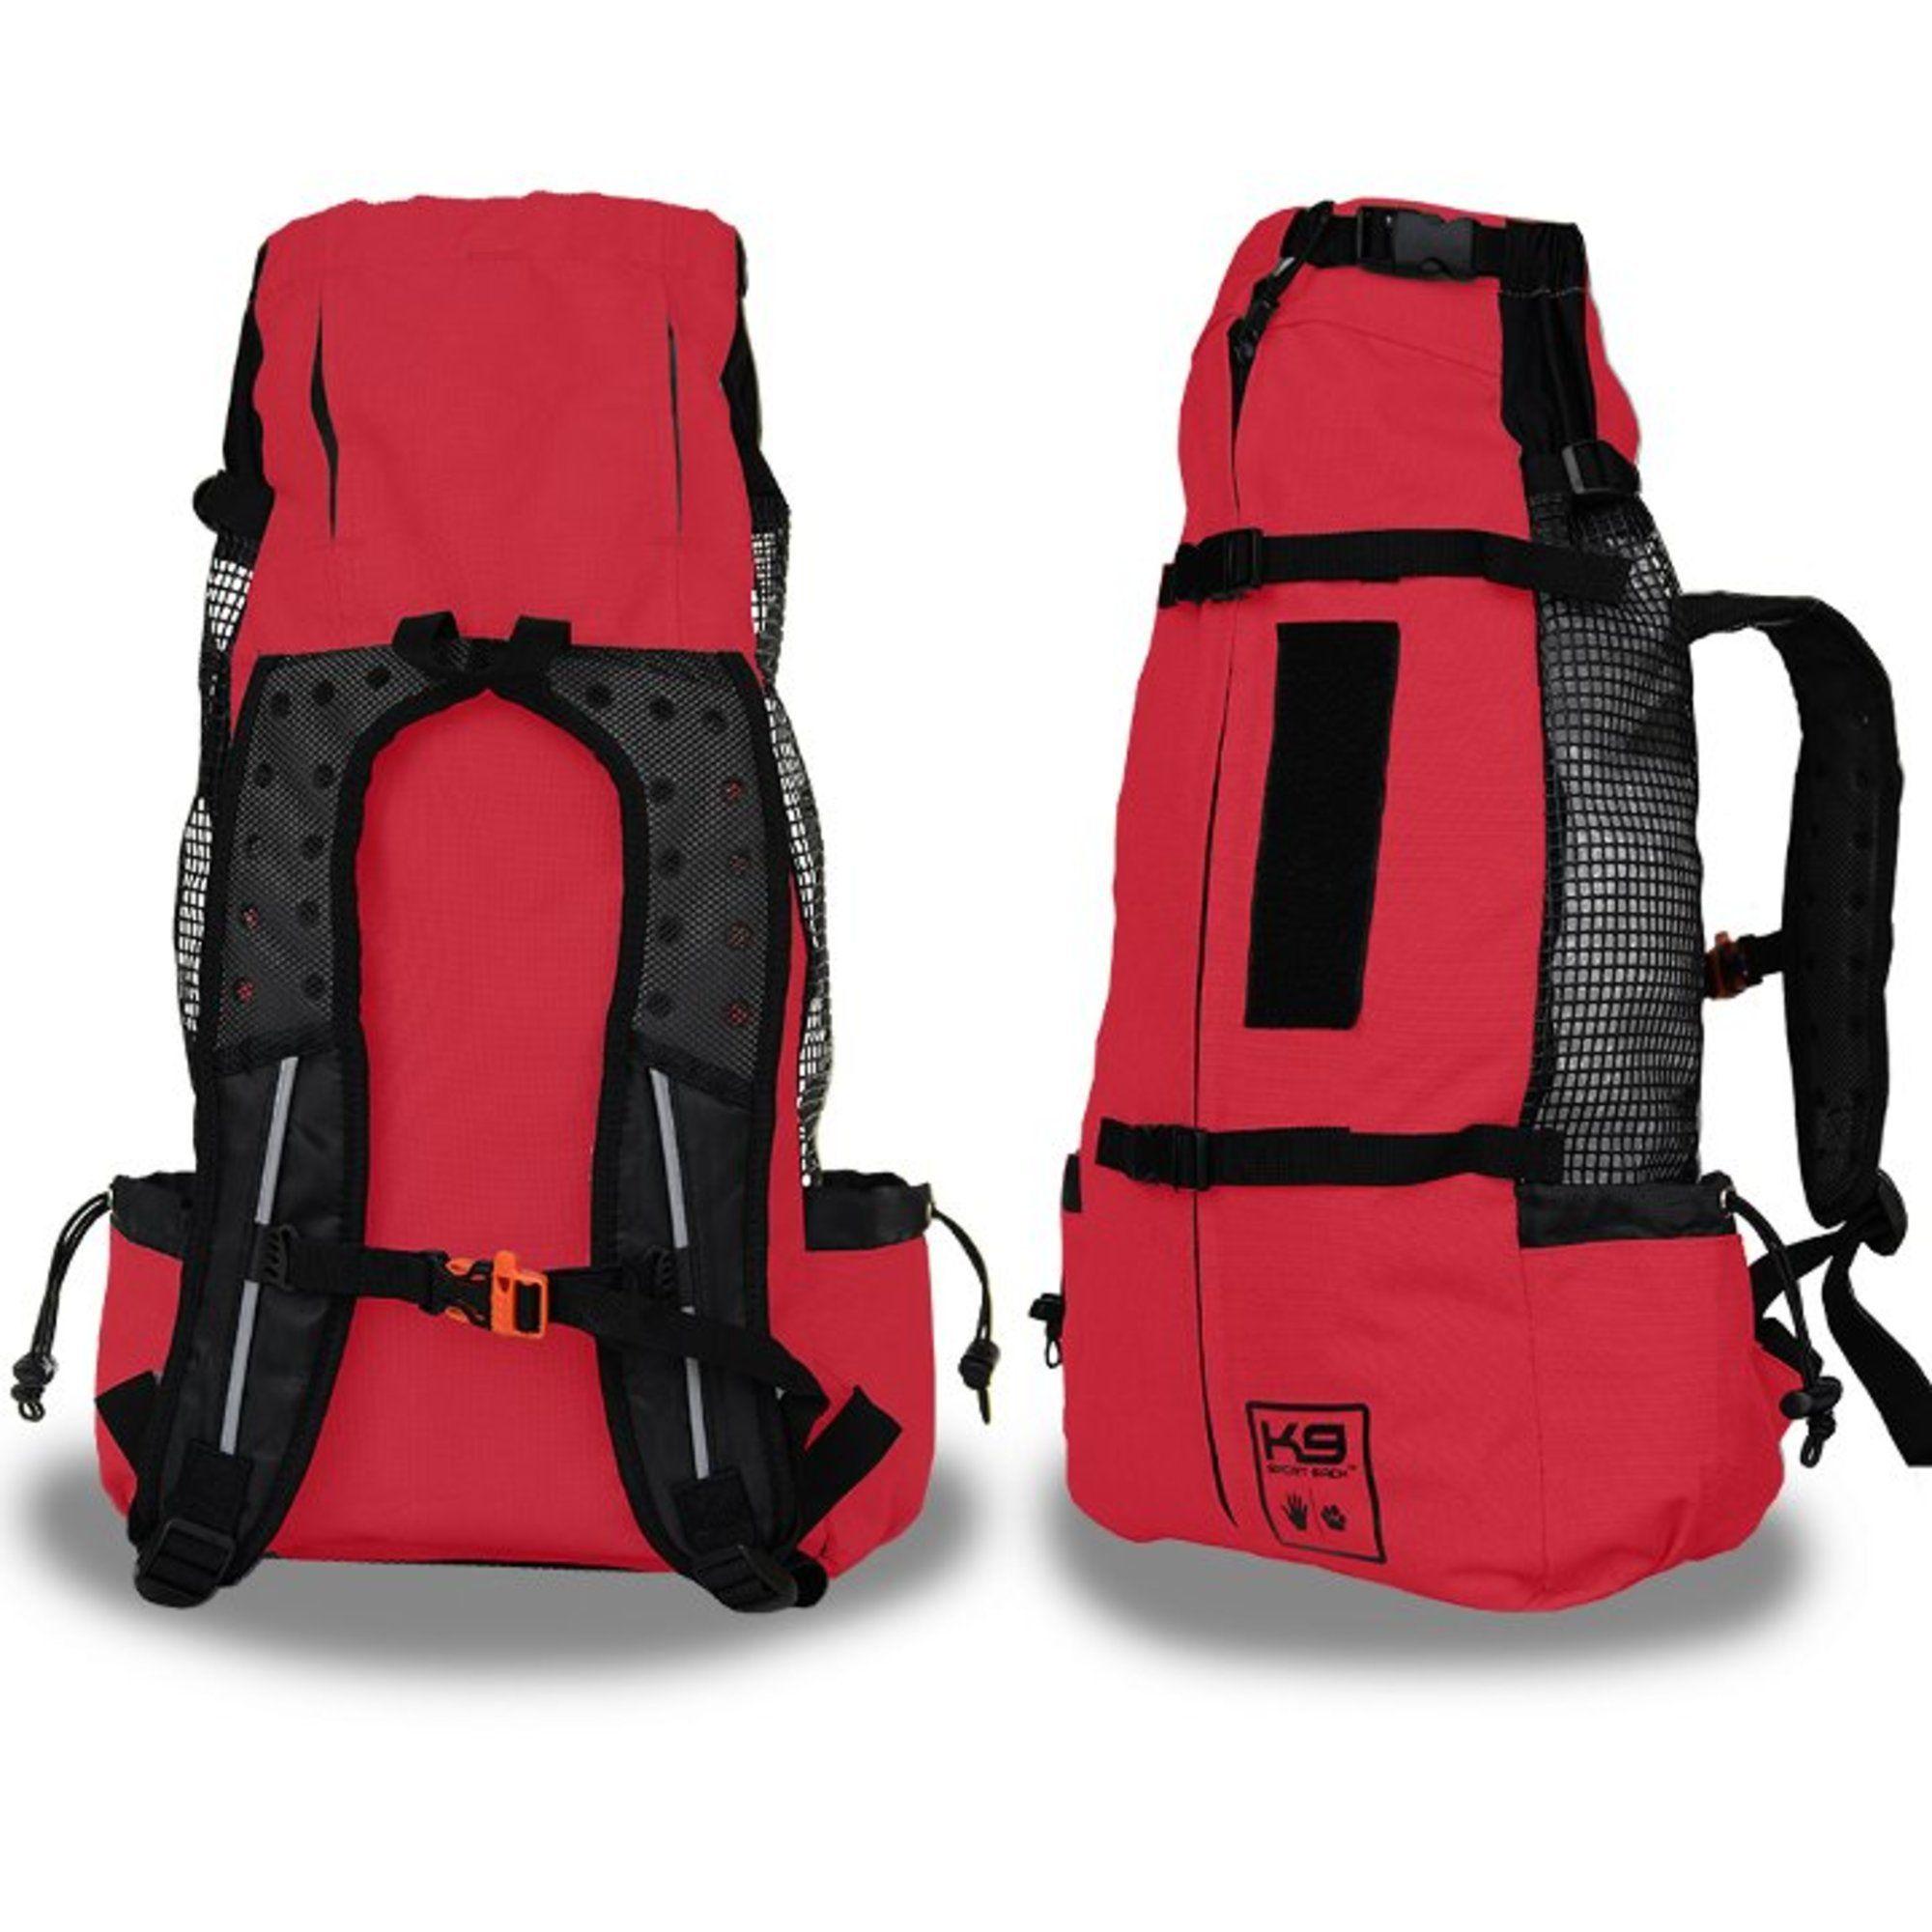 K9 Sport Sack Air Forward Facing Backpack Red Dog Carrier